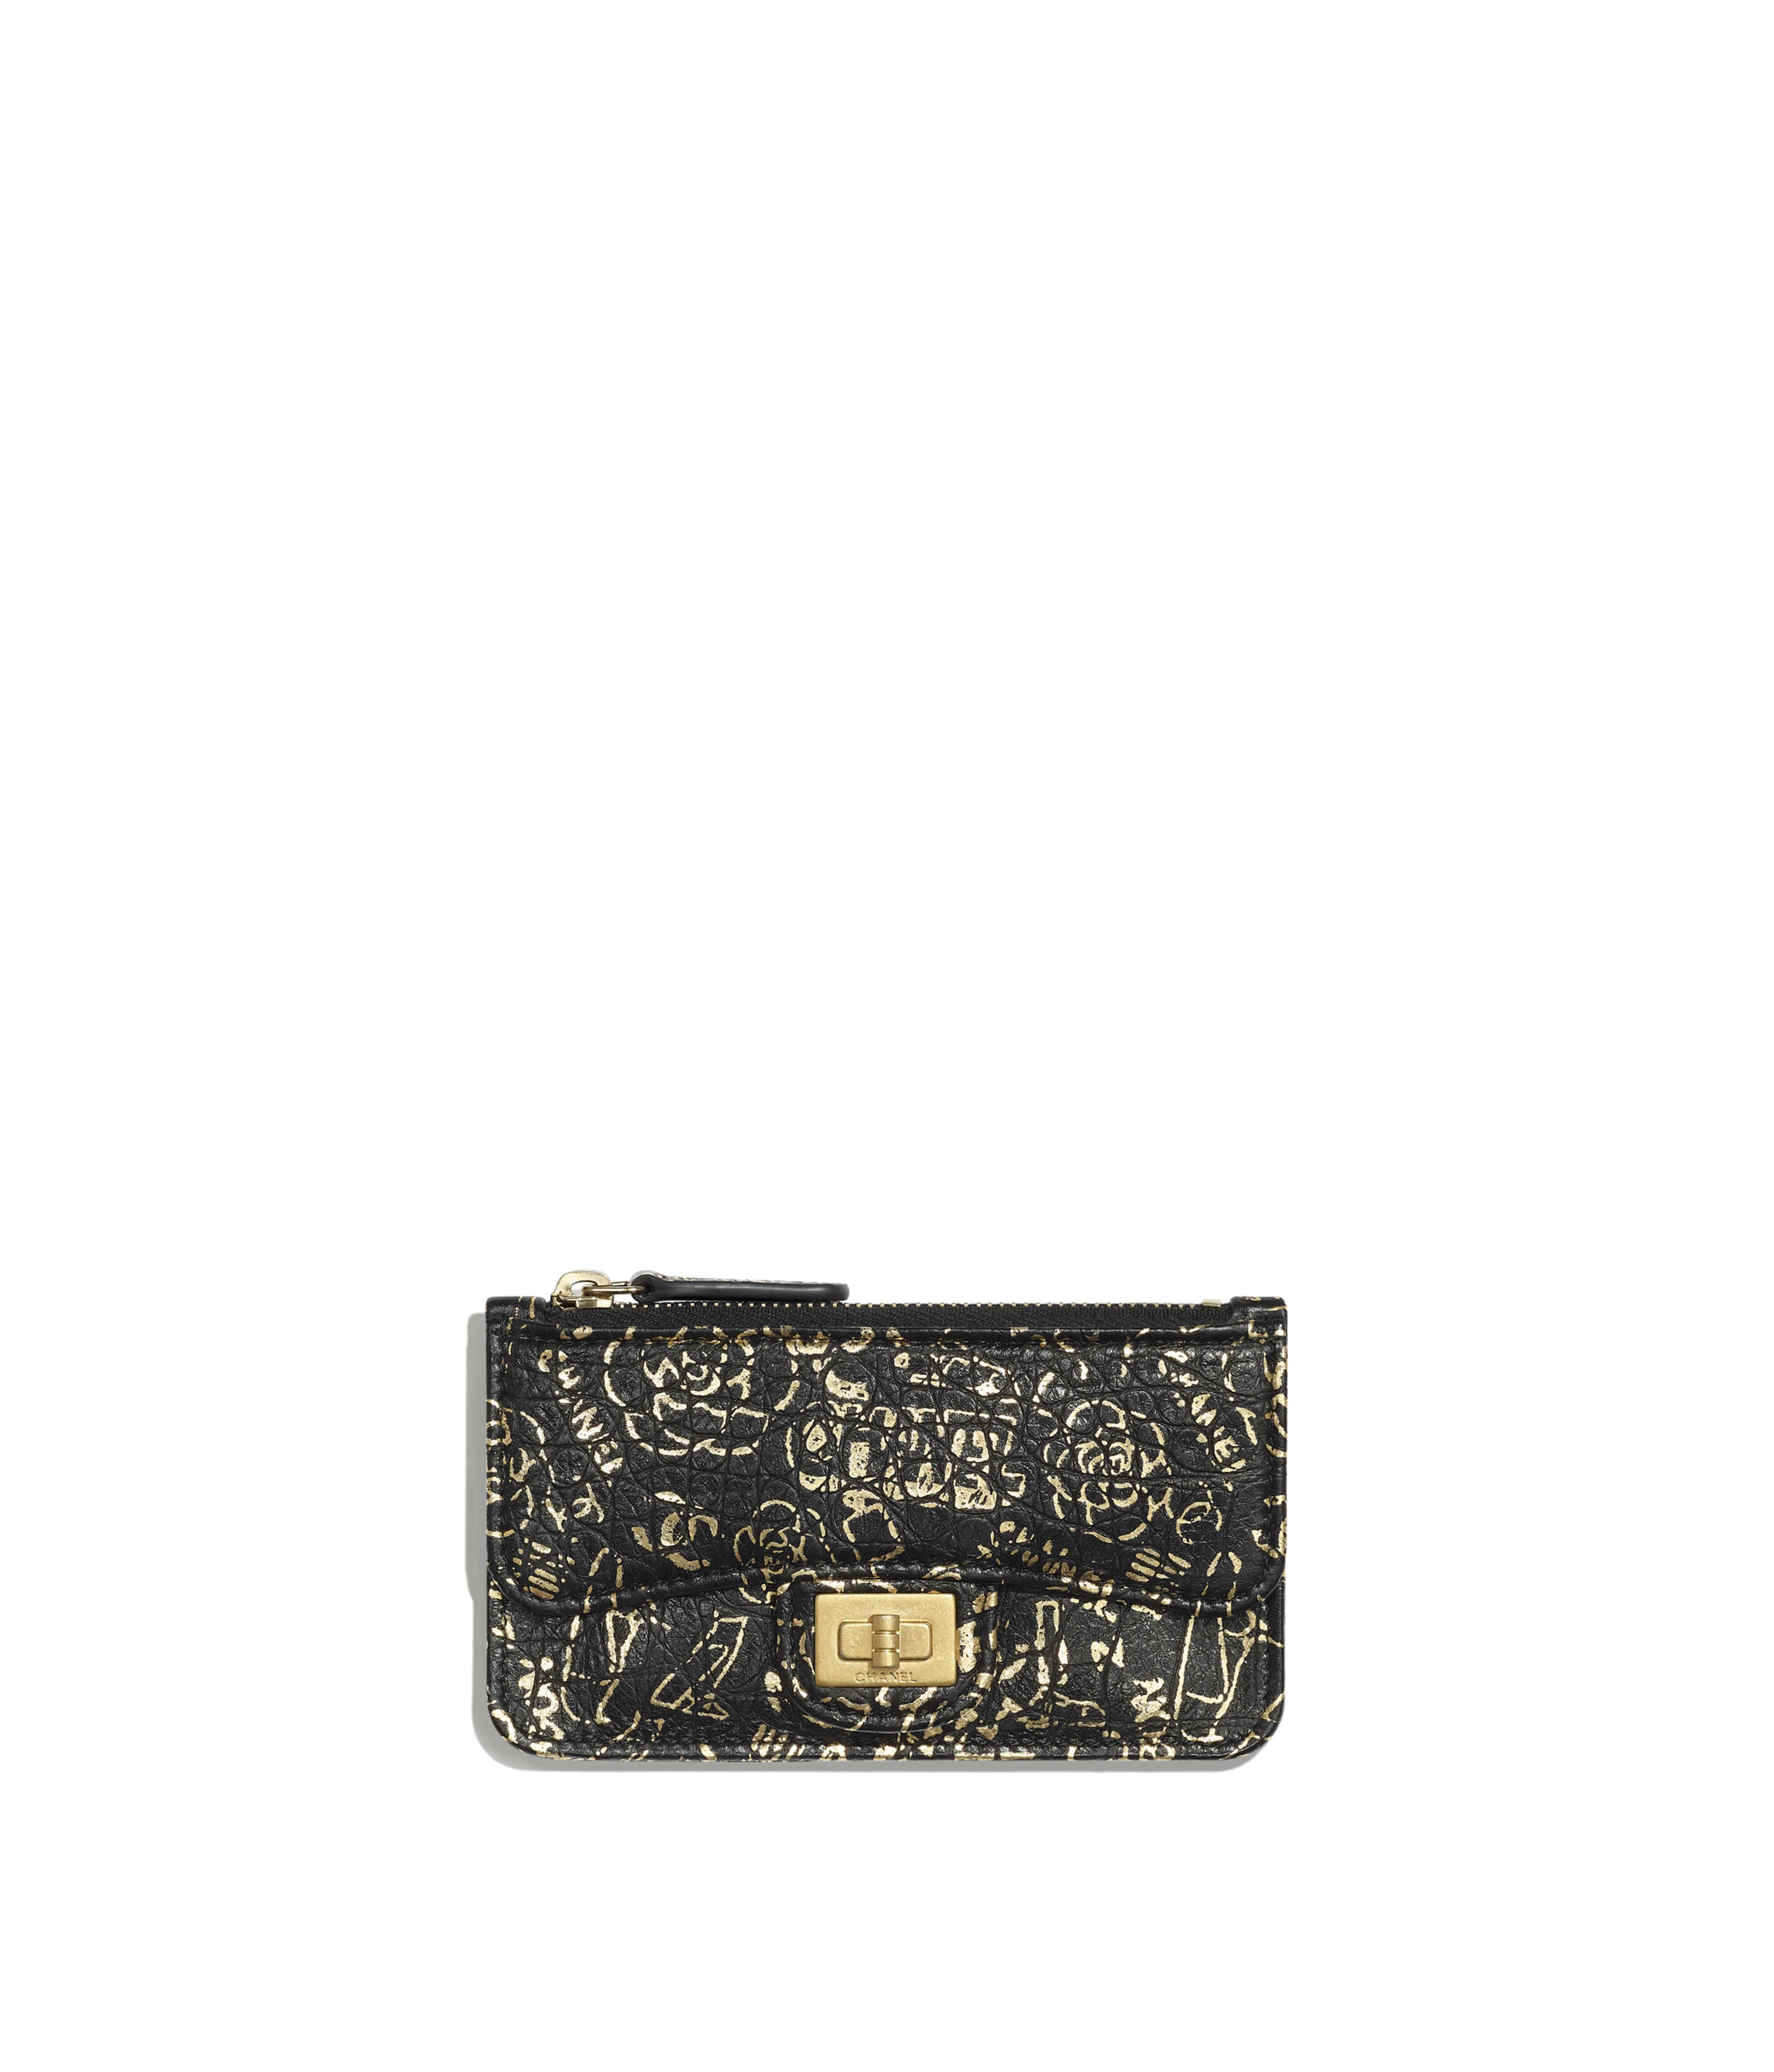 5640b09eed3e 2.55 Flap Card Holder Crocodile Embossed Printed Leather & Gold-Tone Metal,  Black & Gold Ref. AP0624B00979N0784